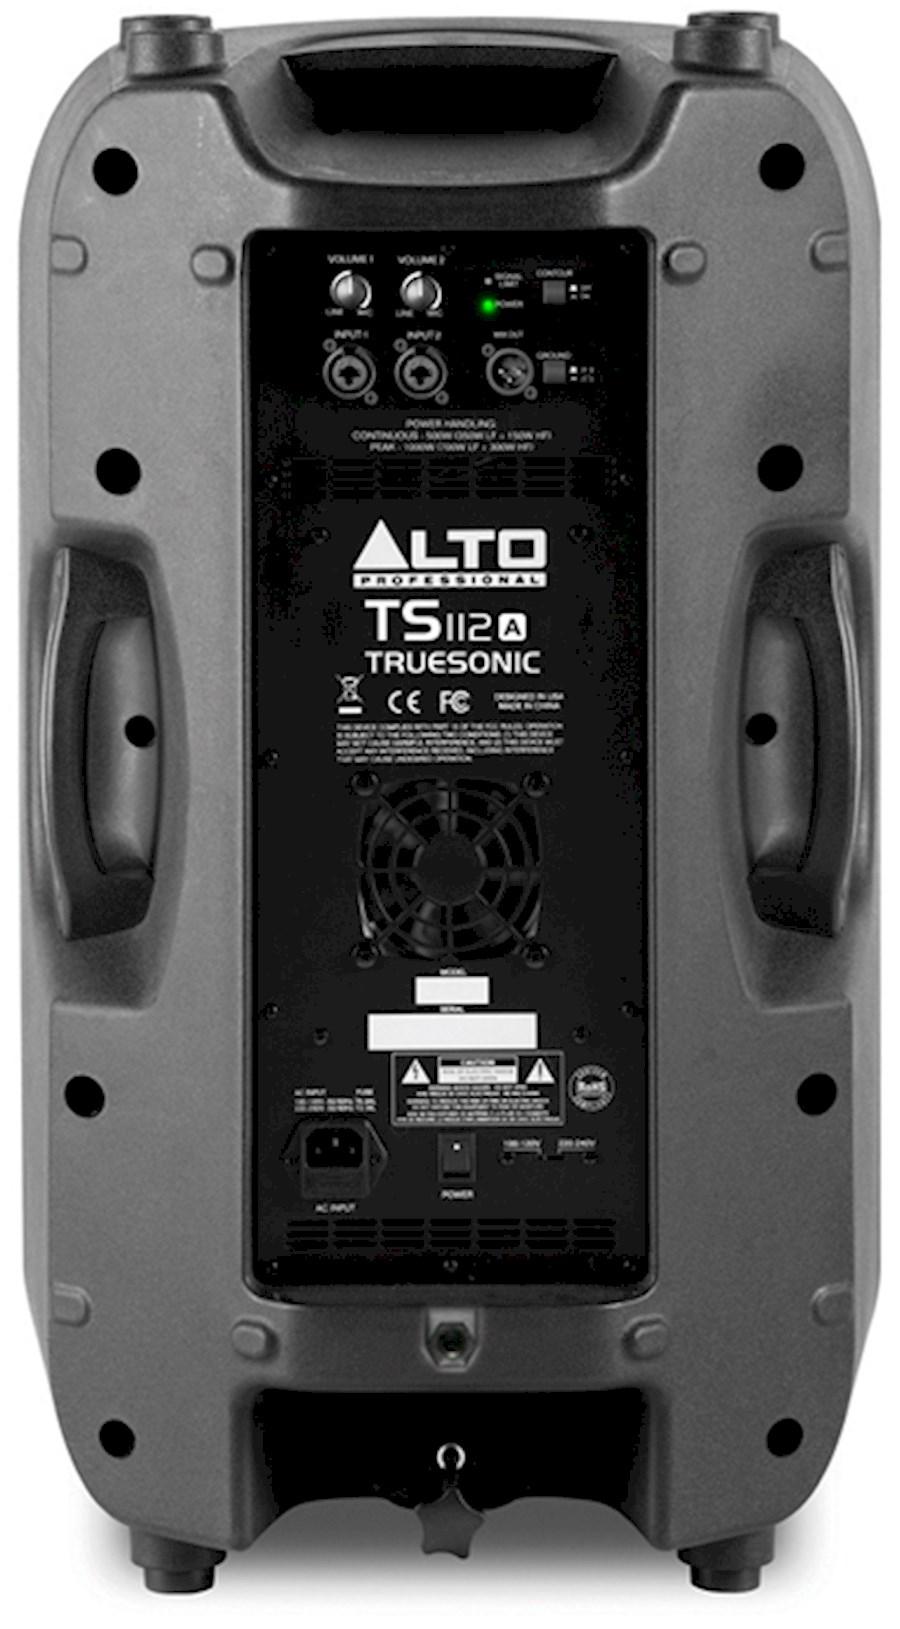 Rent Alto Pro TS-112A V2 ac... from Klaasjan